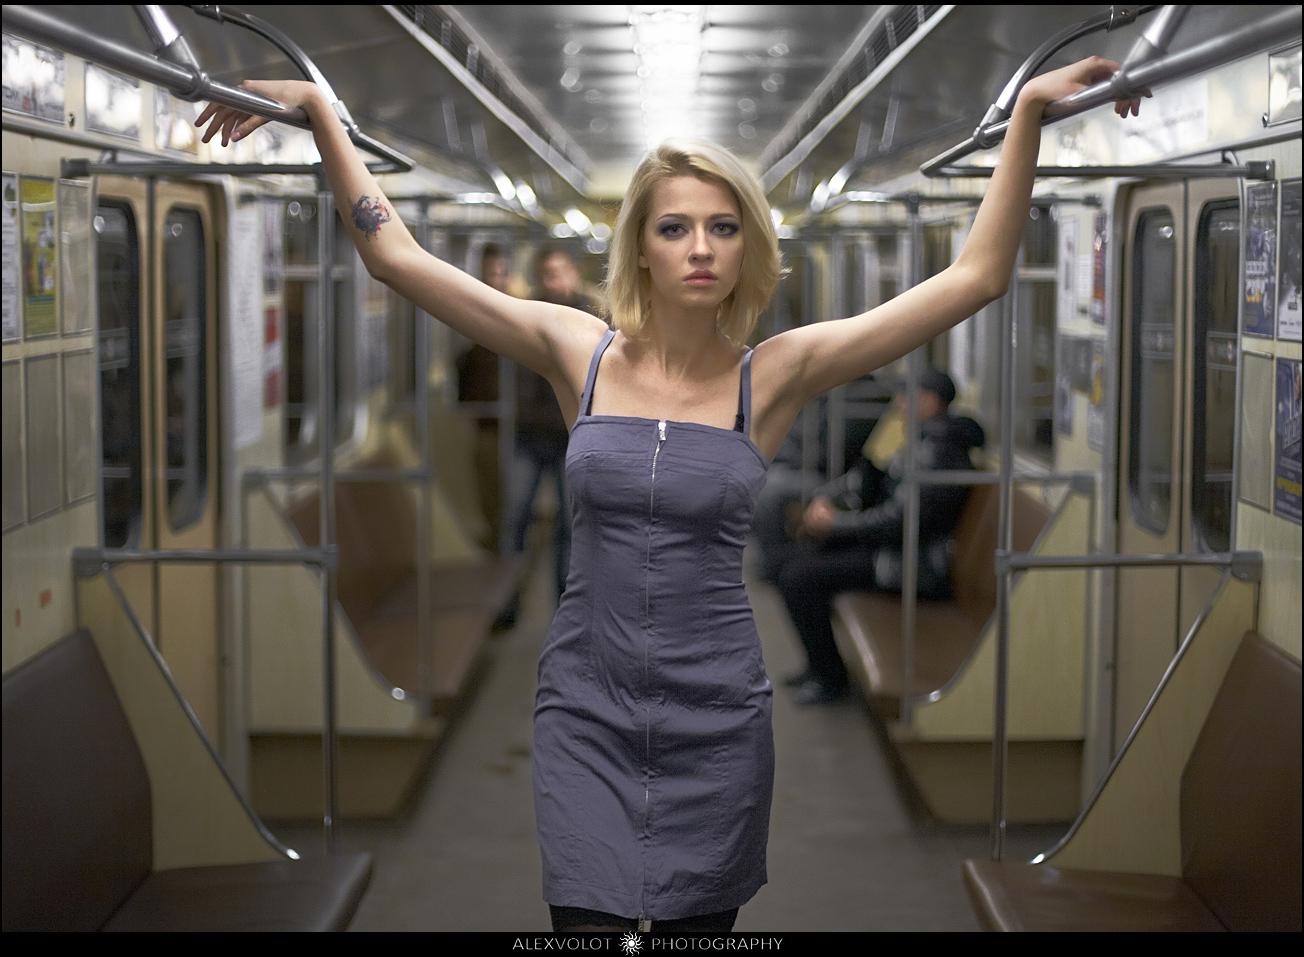 golaya-devushka-v-poezde-metro